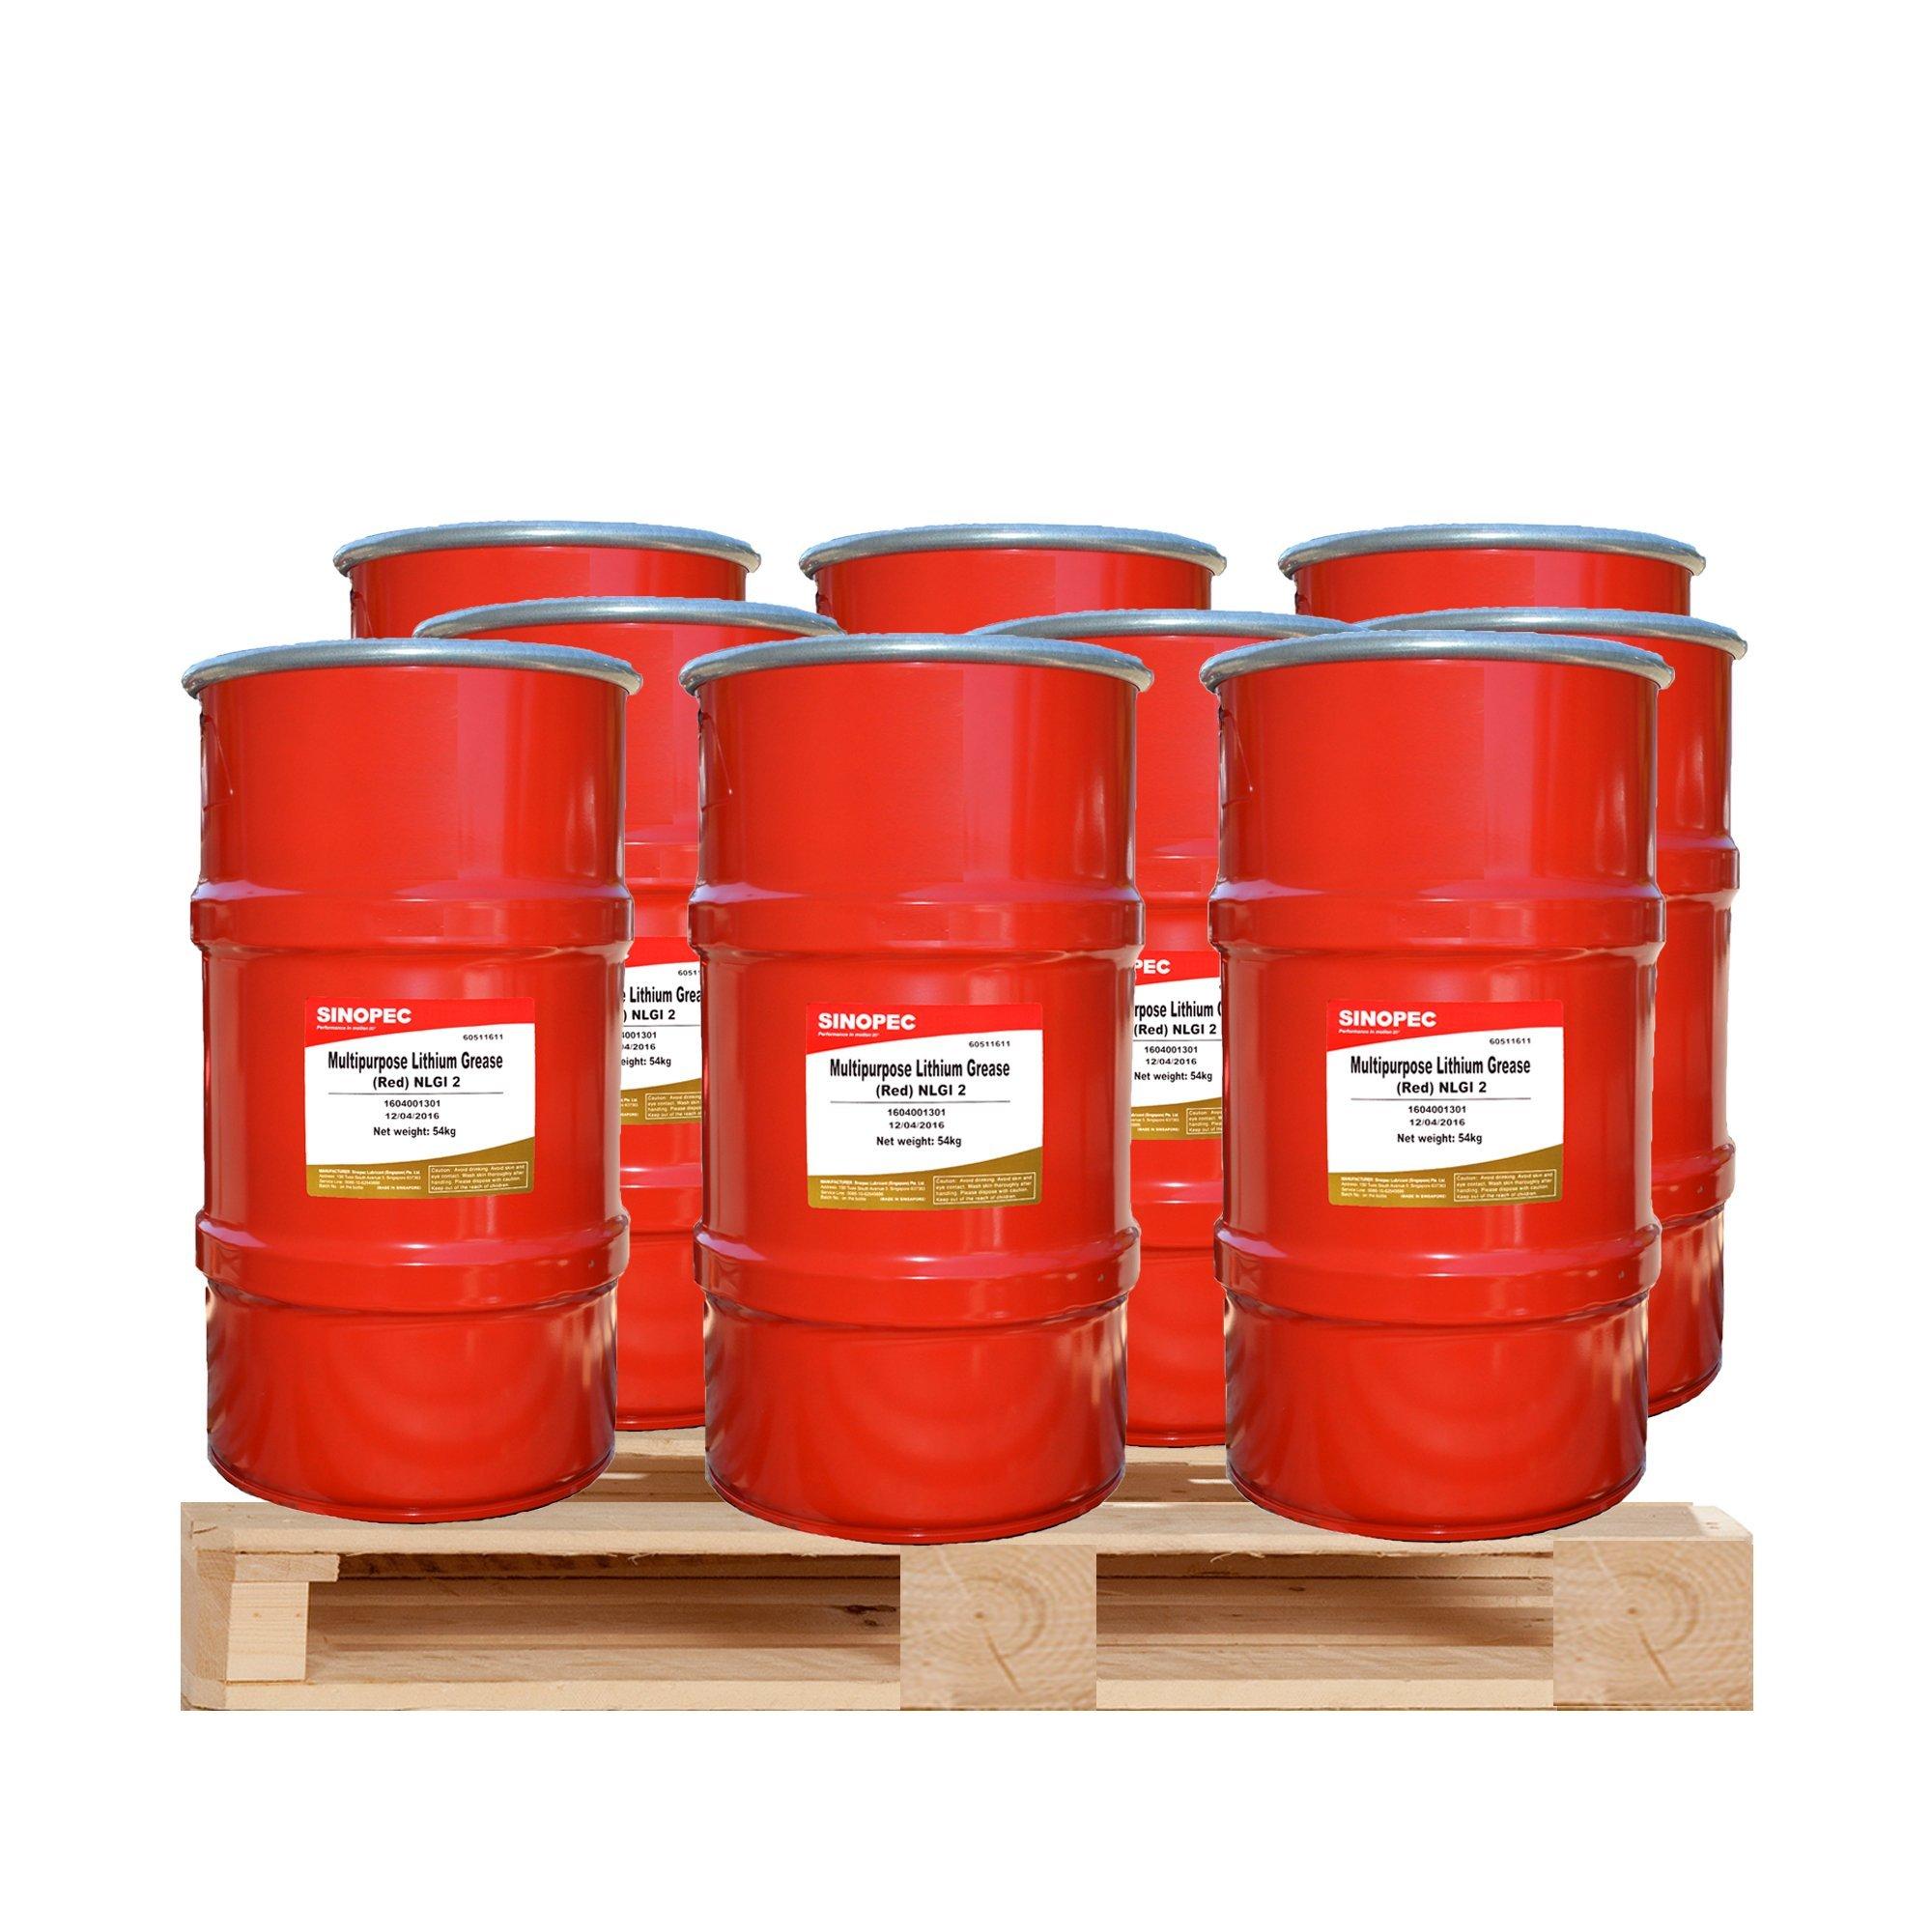 $168 Each - (9) Kegs of Red Multipurpose Lithium Grease #2 - 120LB. (16 Gallon) Keg